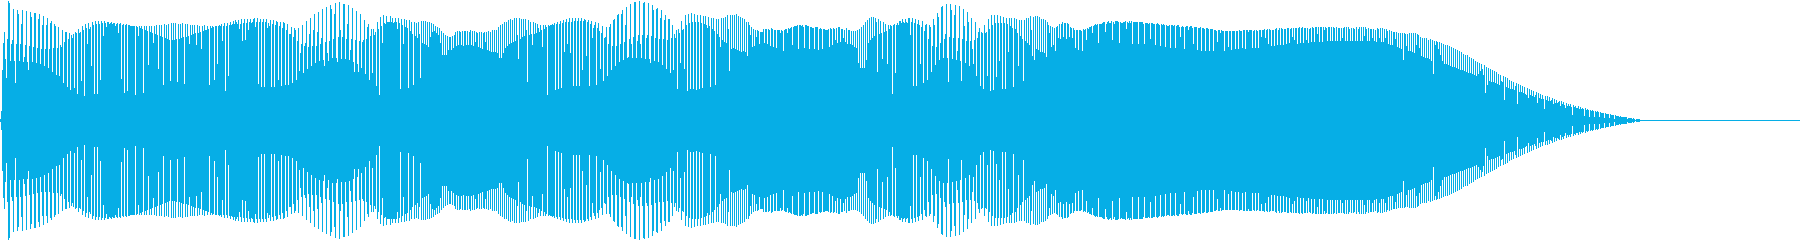 Yeah イェイイェーイ!!という効果音の再生済みの波形